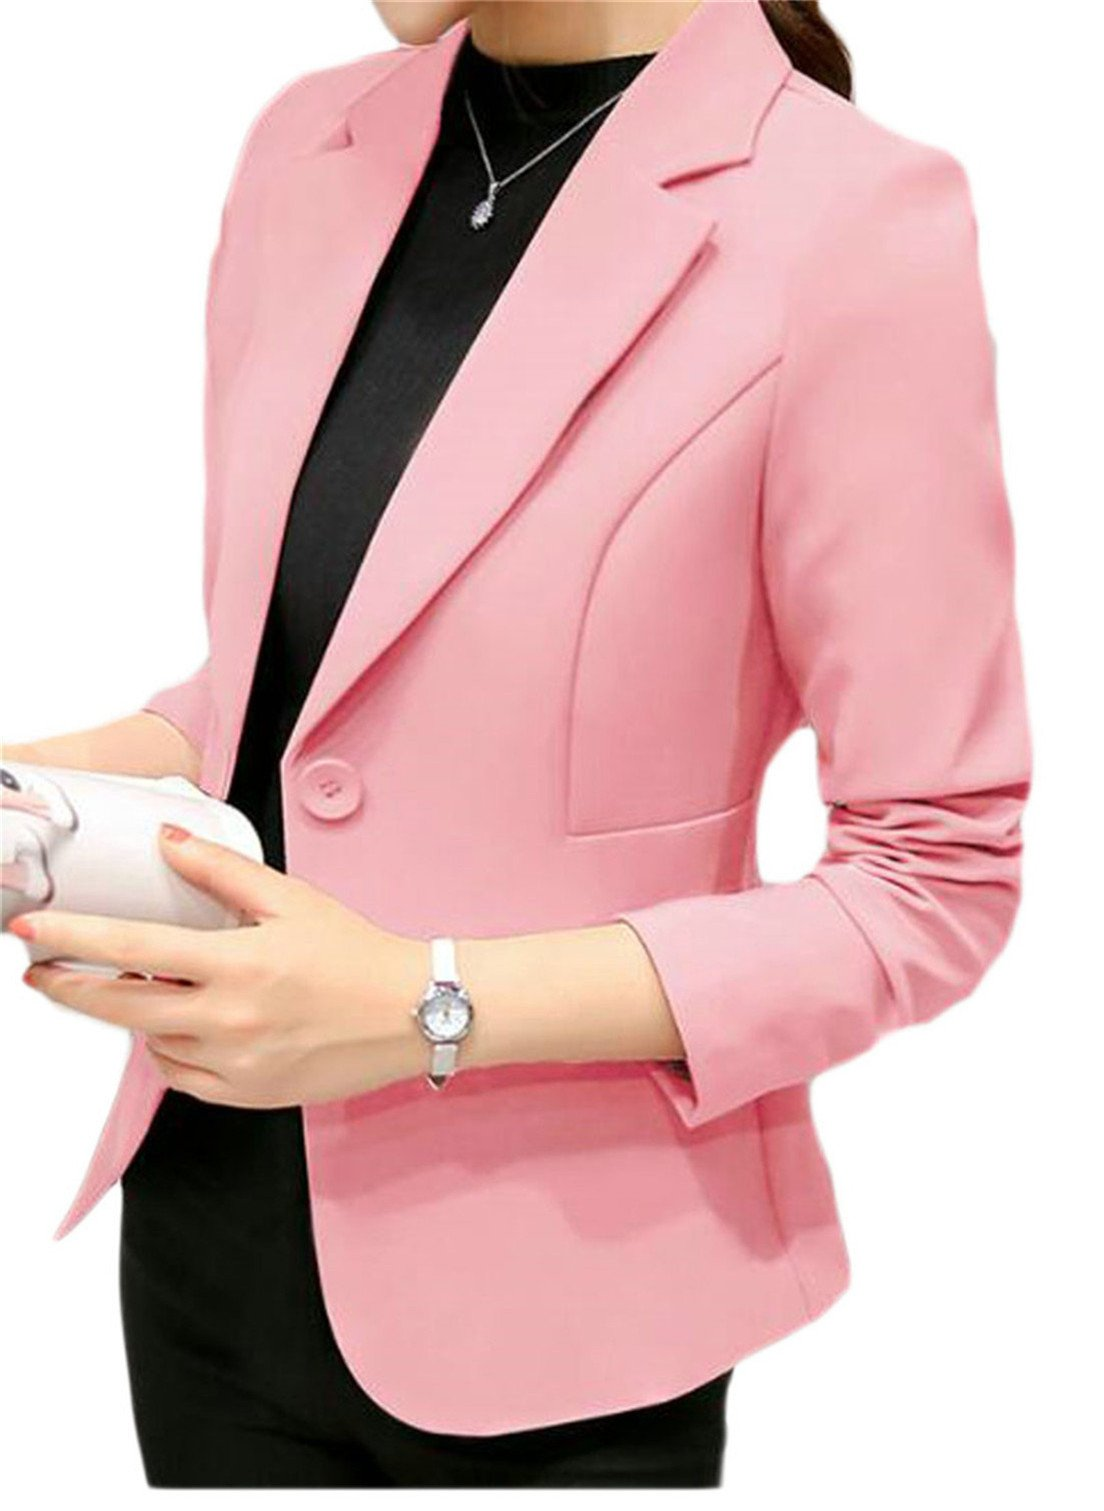 SELX-Women Work Office Blazer Coat Casual Long Sleeve Solid Open Front Business Jacket Pink US L